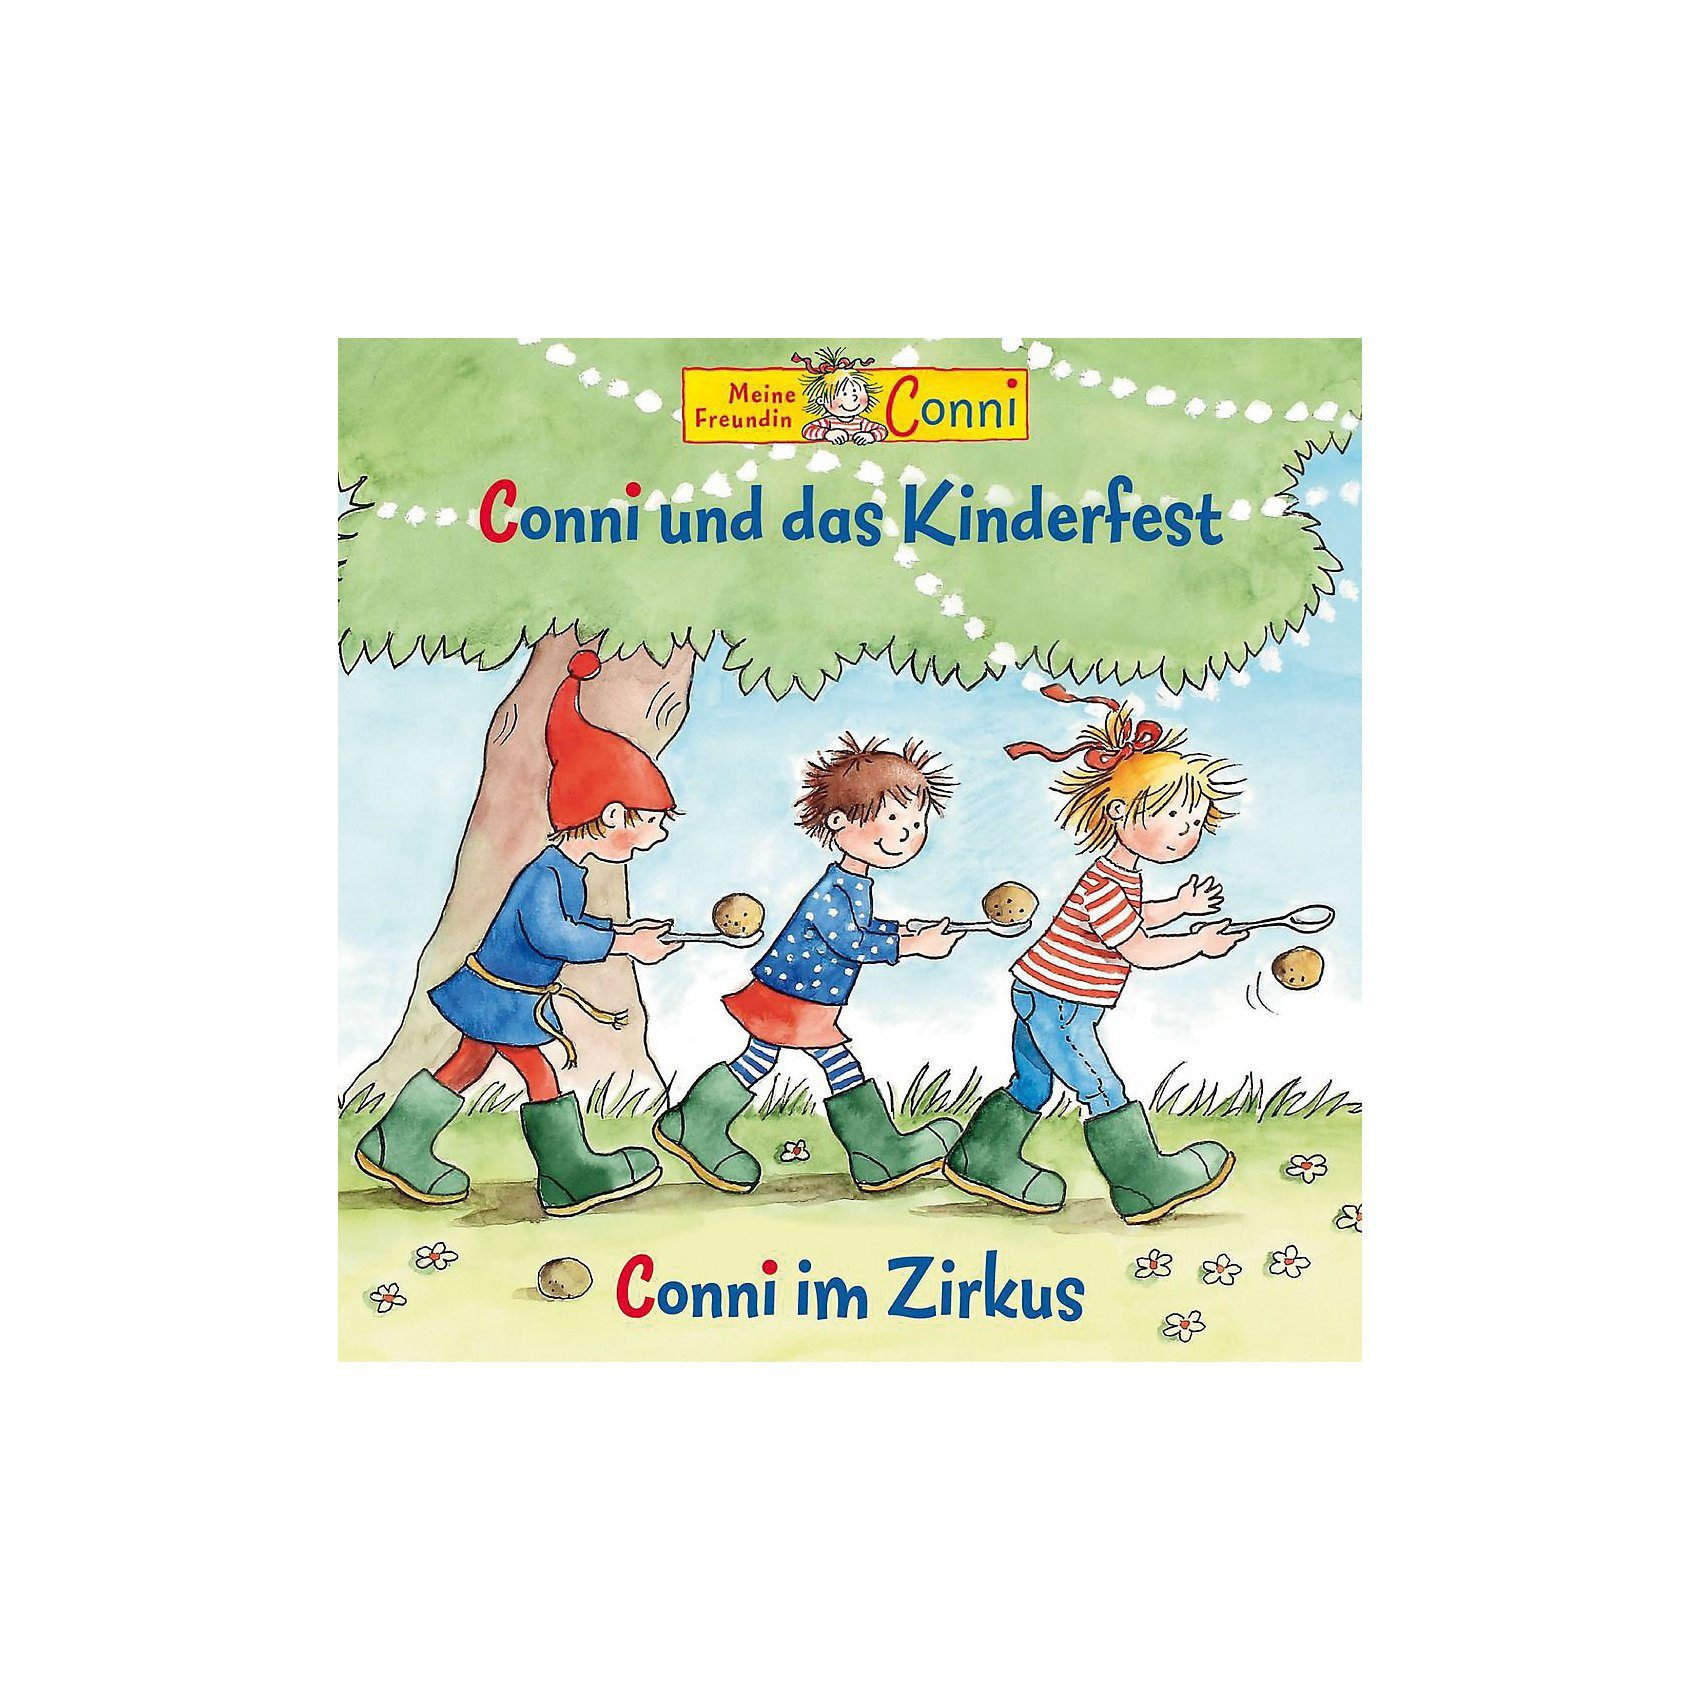 Universal CD Conni 42 - Conni und das Kinderfest/Conni im Zirkus